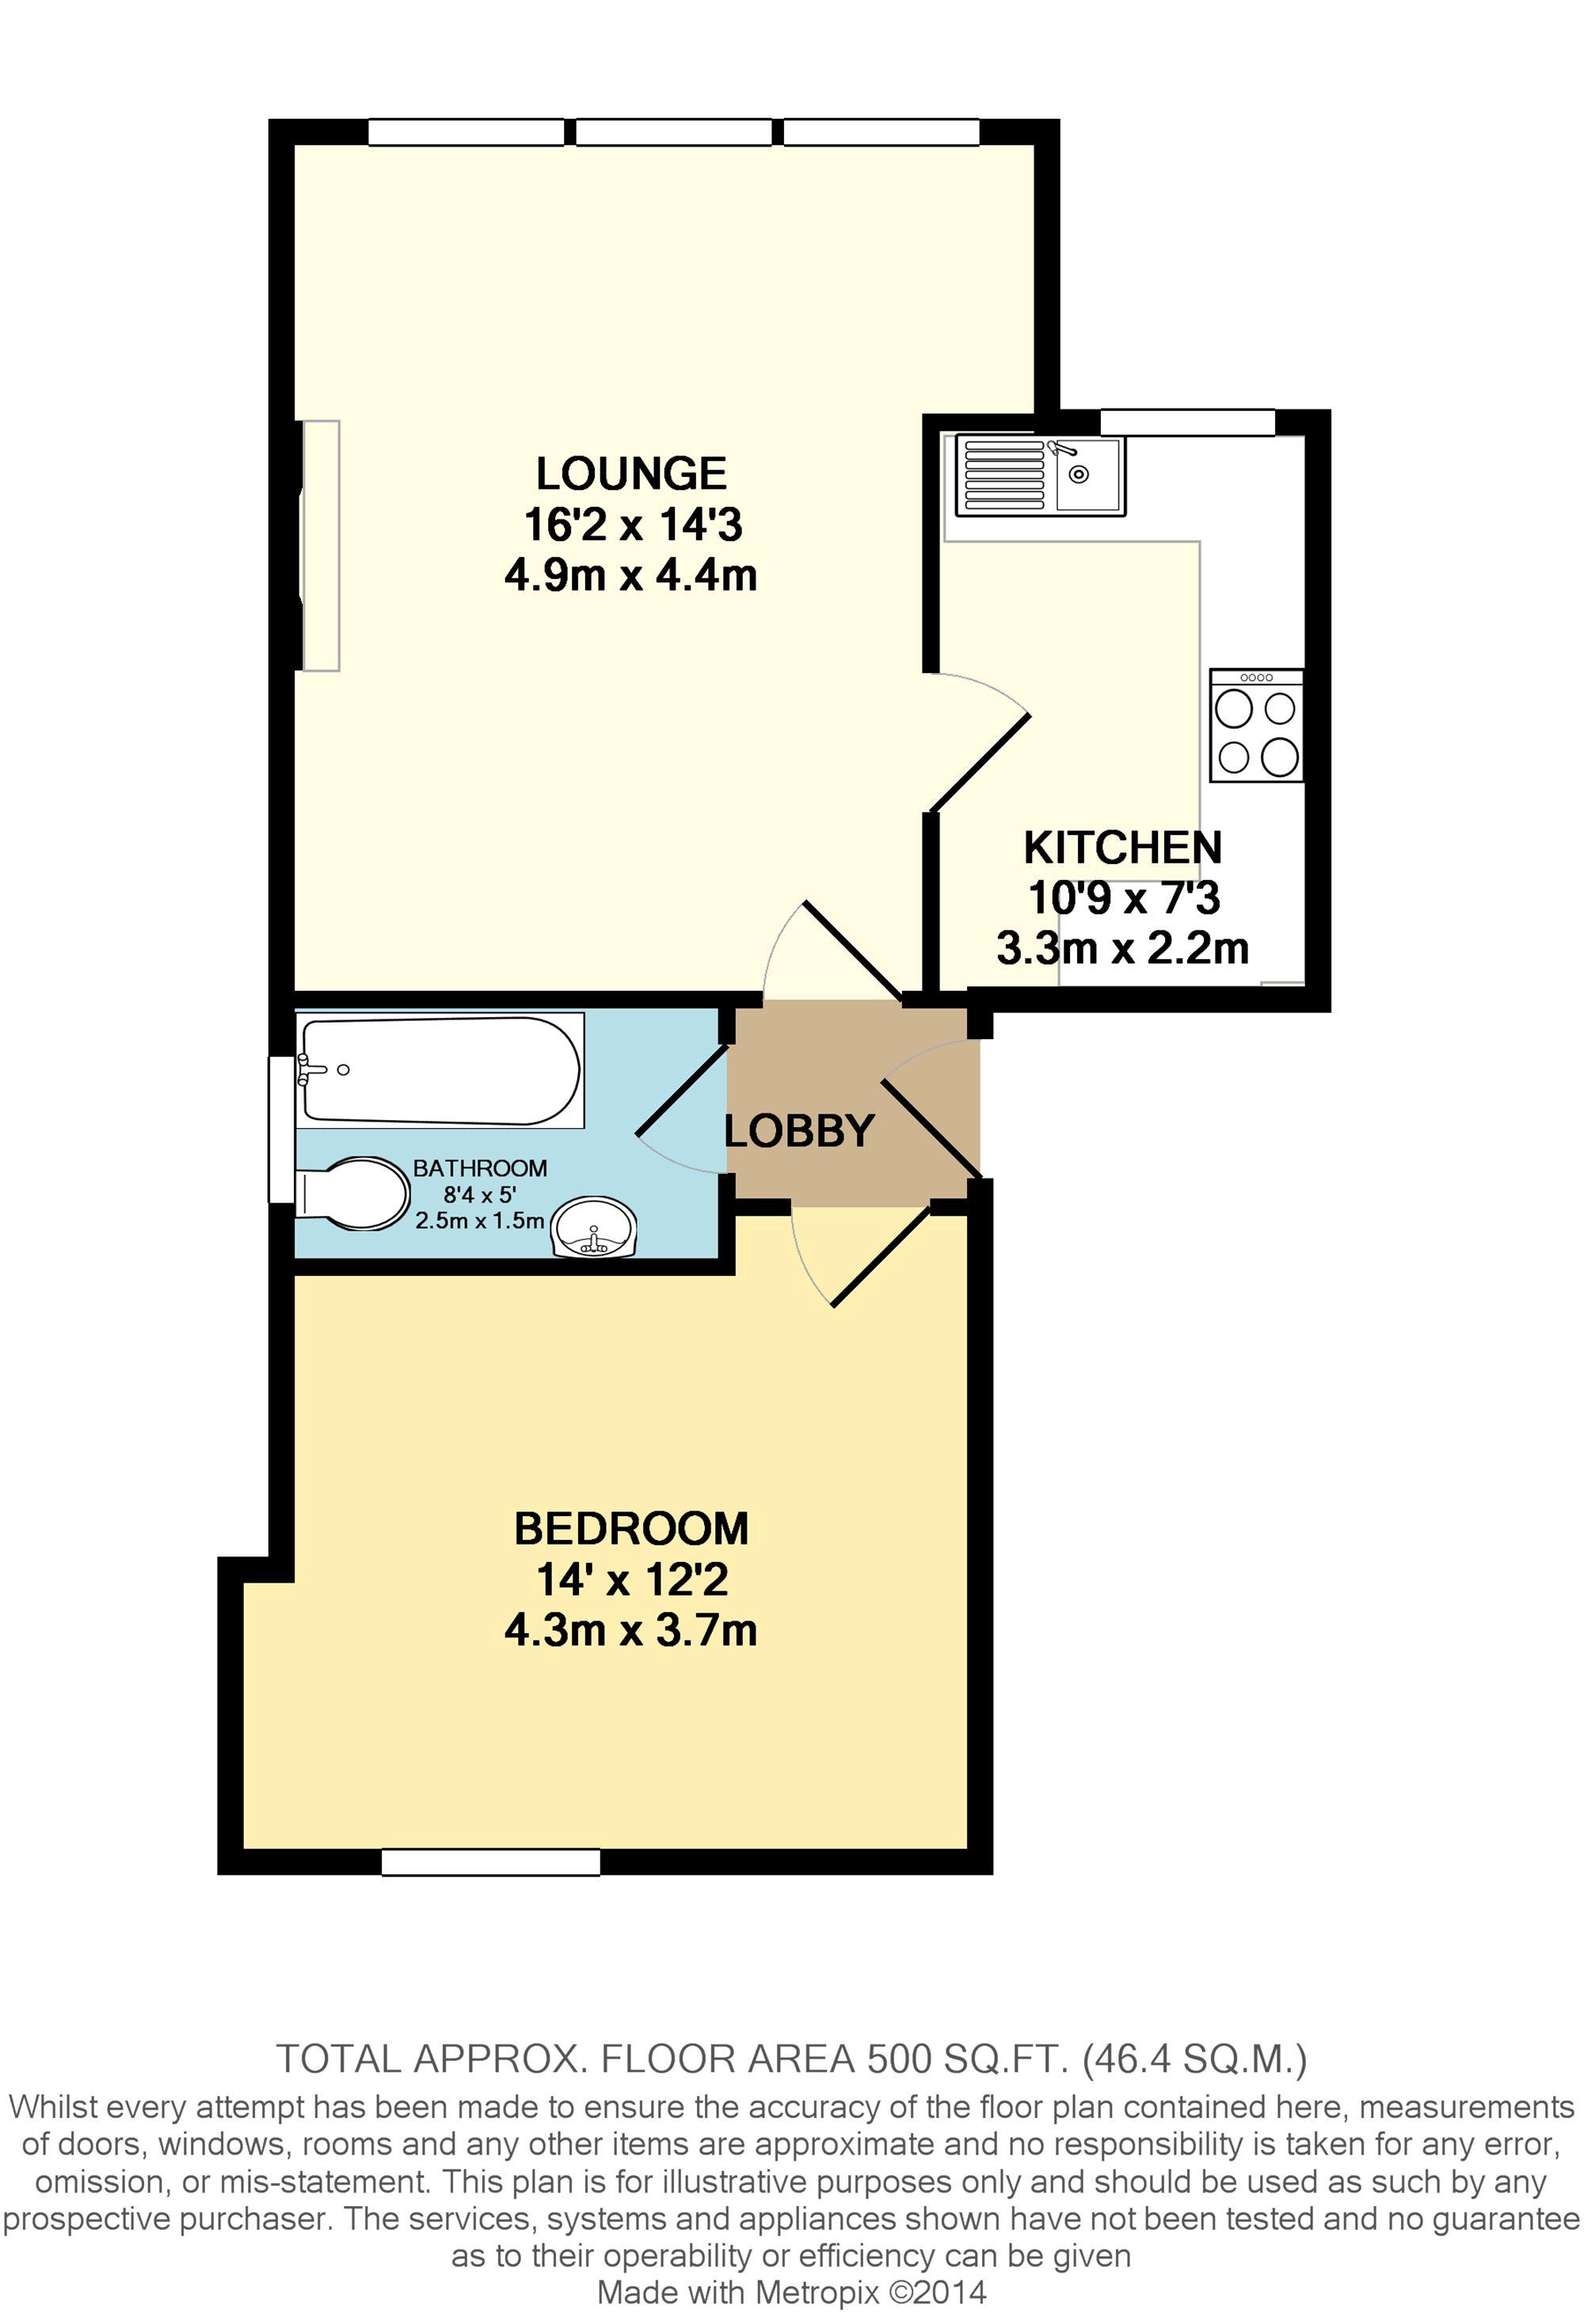 Floorplan of property at 11-13 Wilton Road